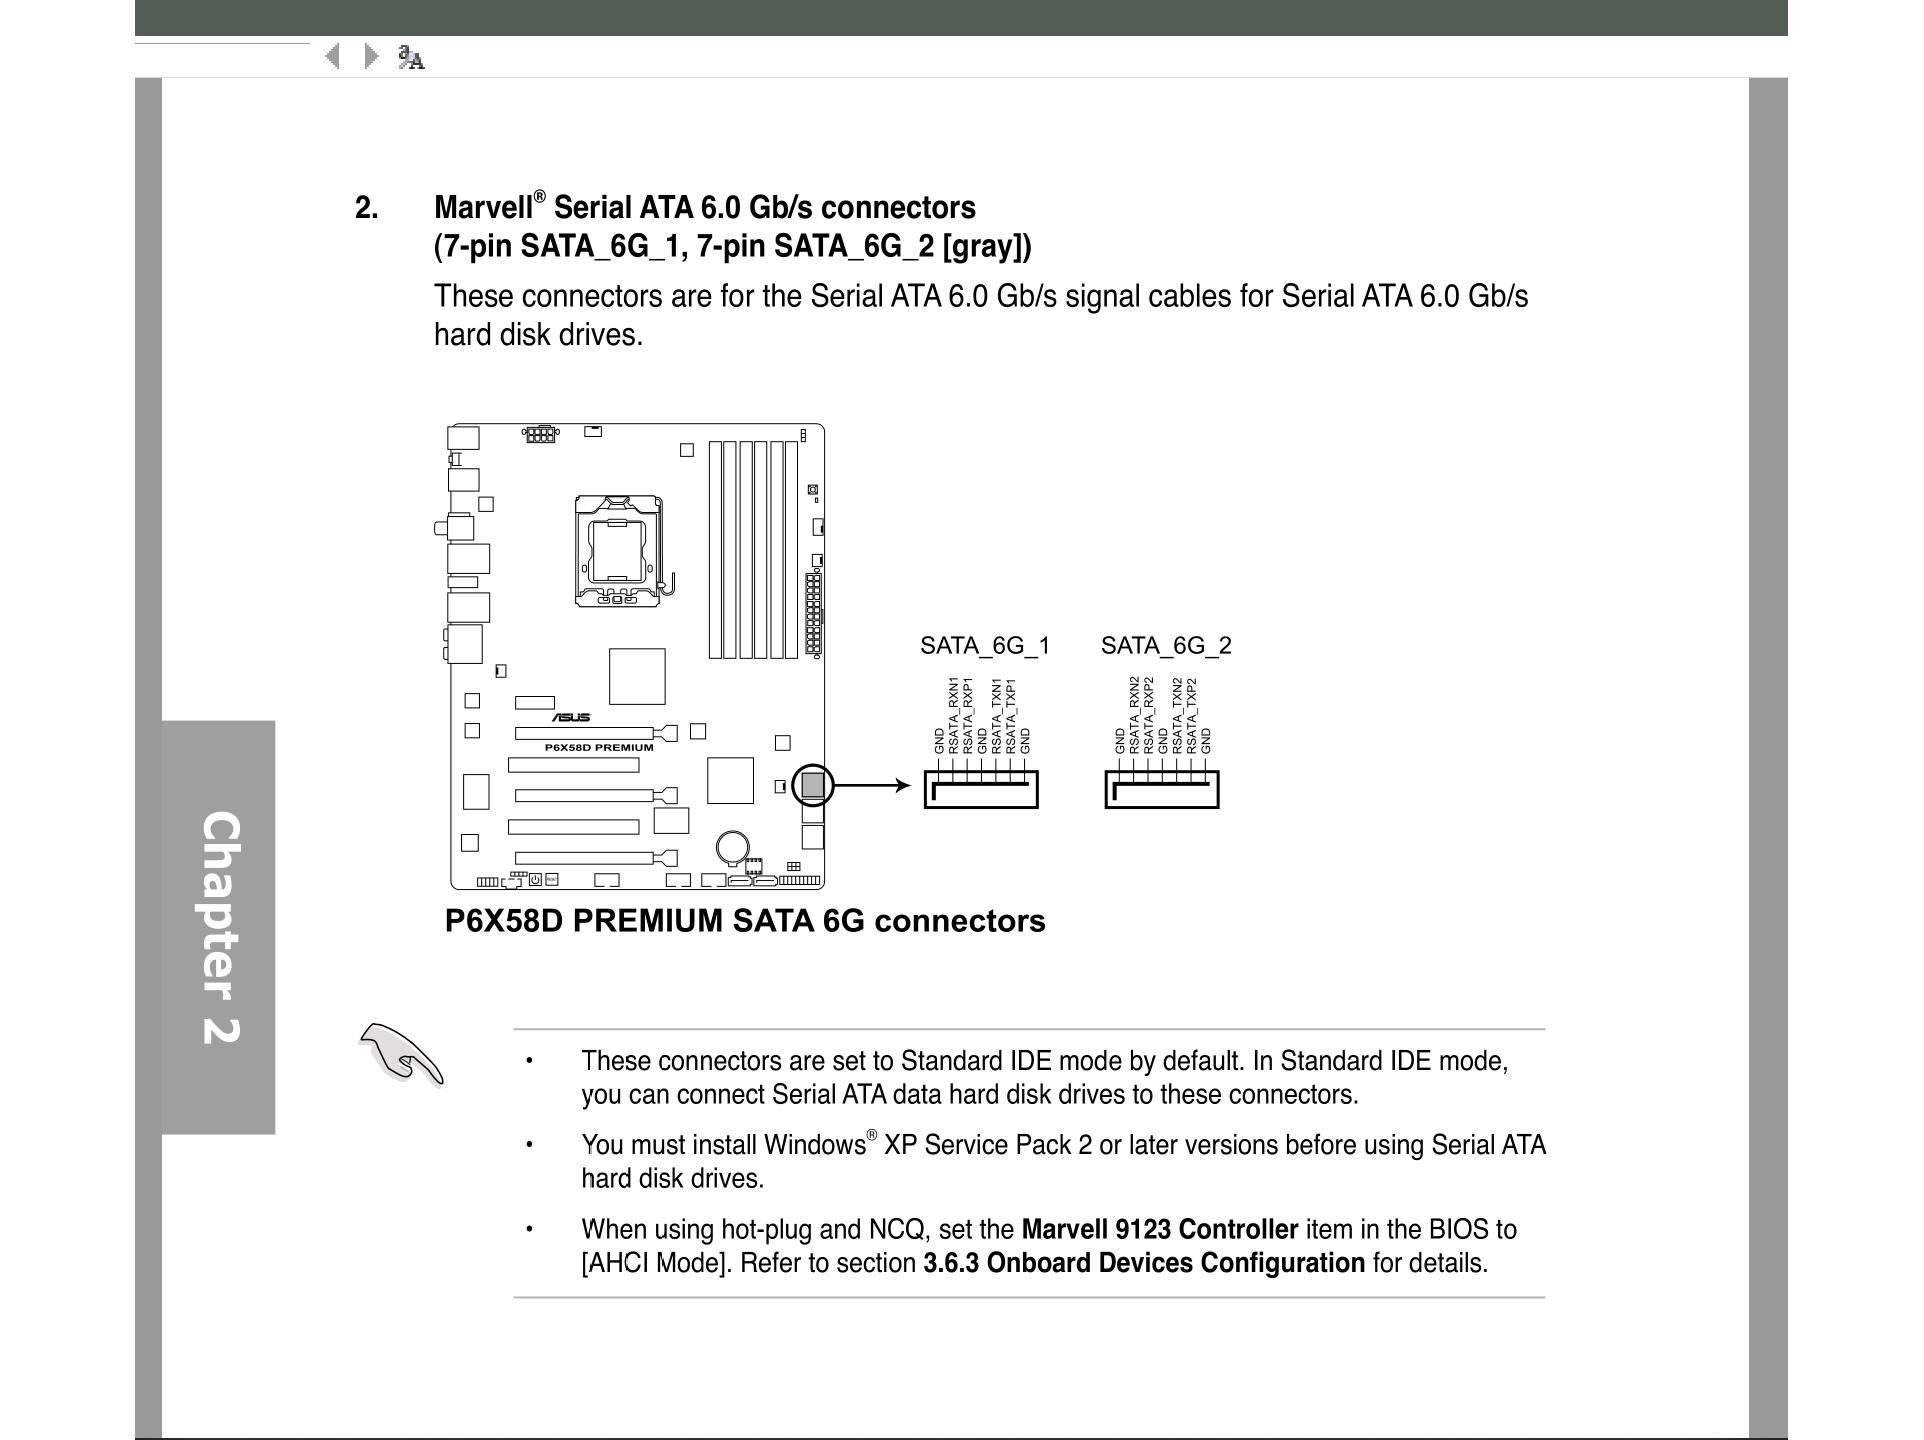 Samsung 860 EVO SATA III with older motherboard | [H]ard|Forum